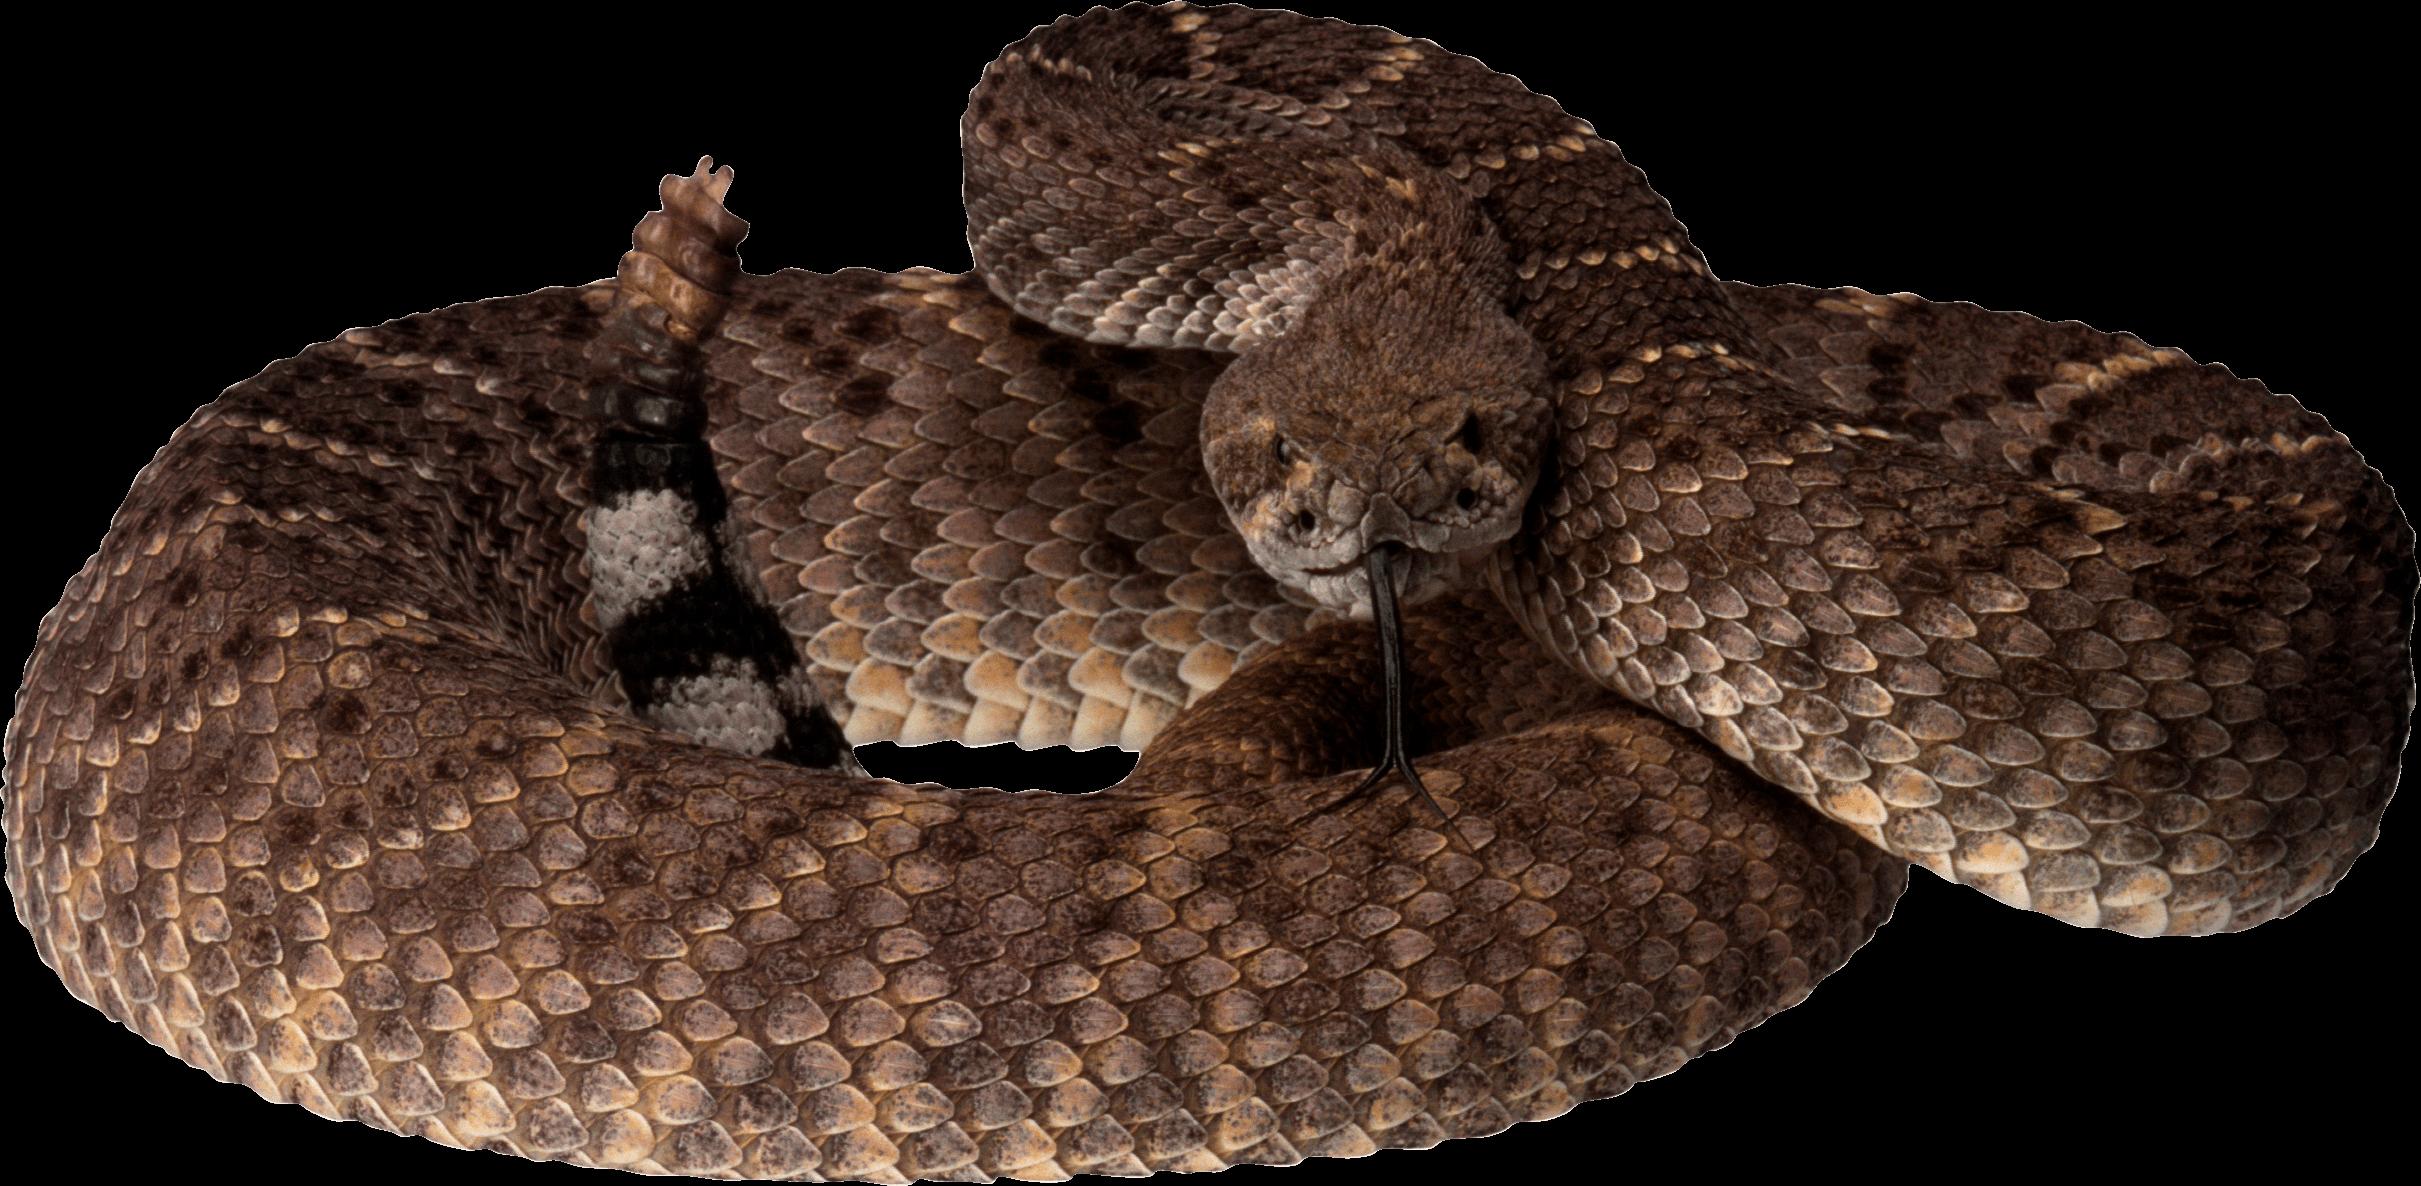 Brown Snake PNG Image